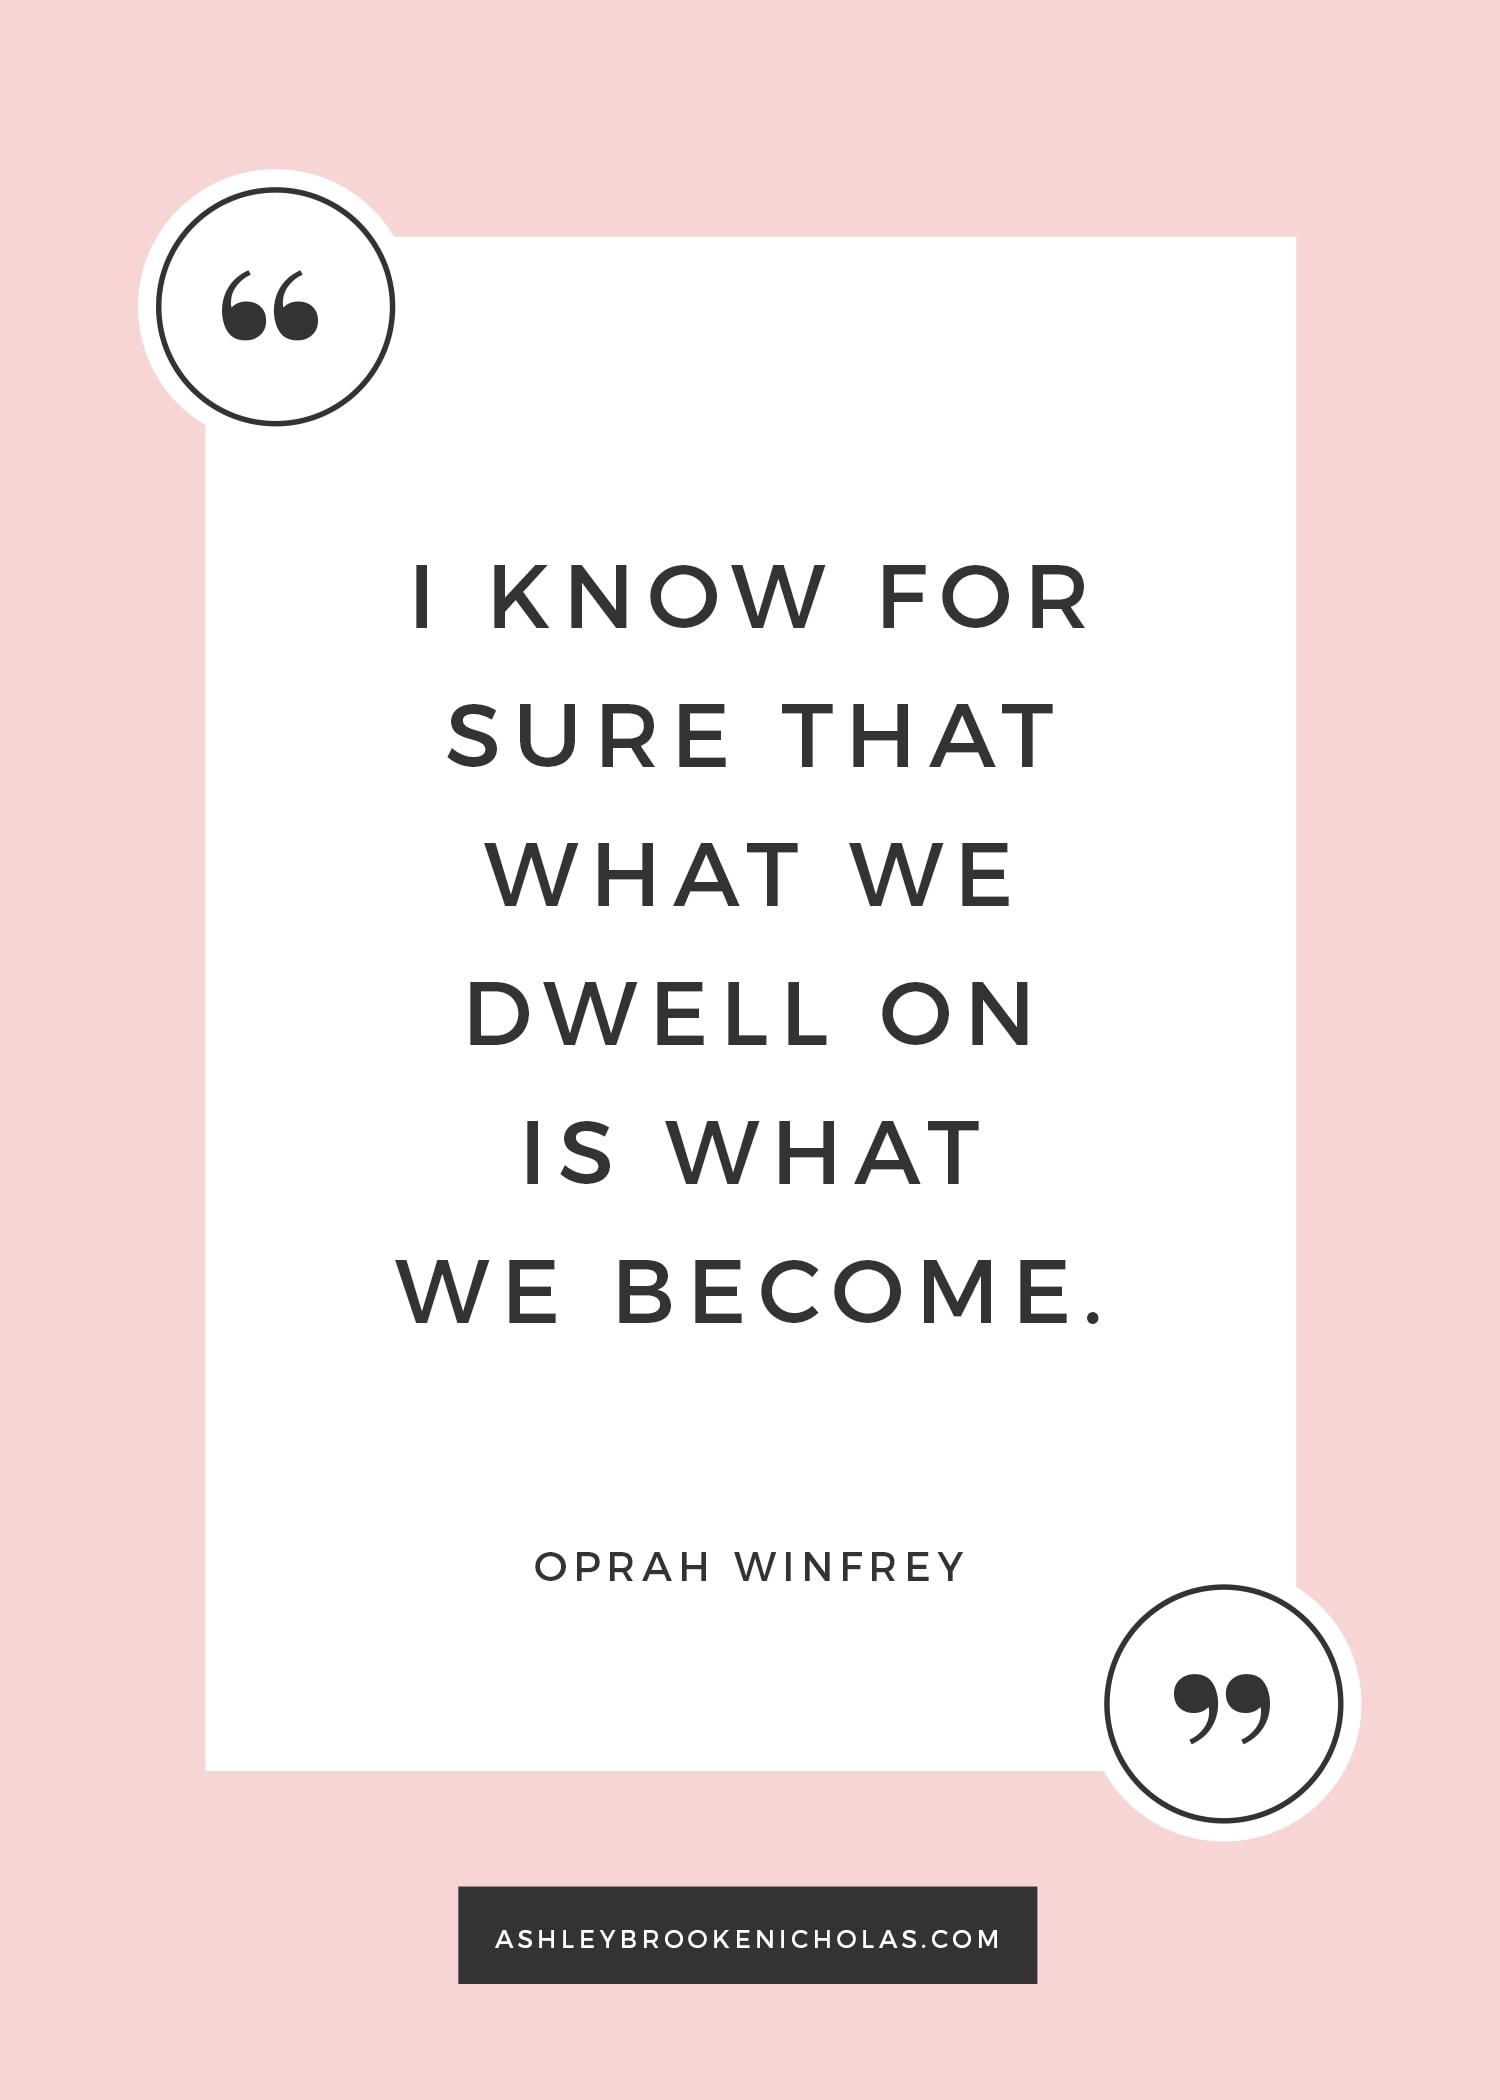 cute girl boss quotes lifestyle blogger Ashley Brooke Nicholas